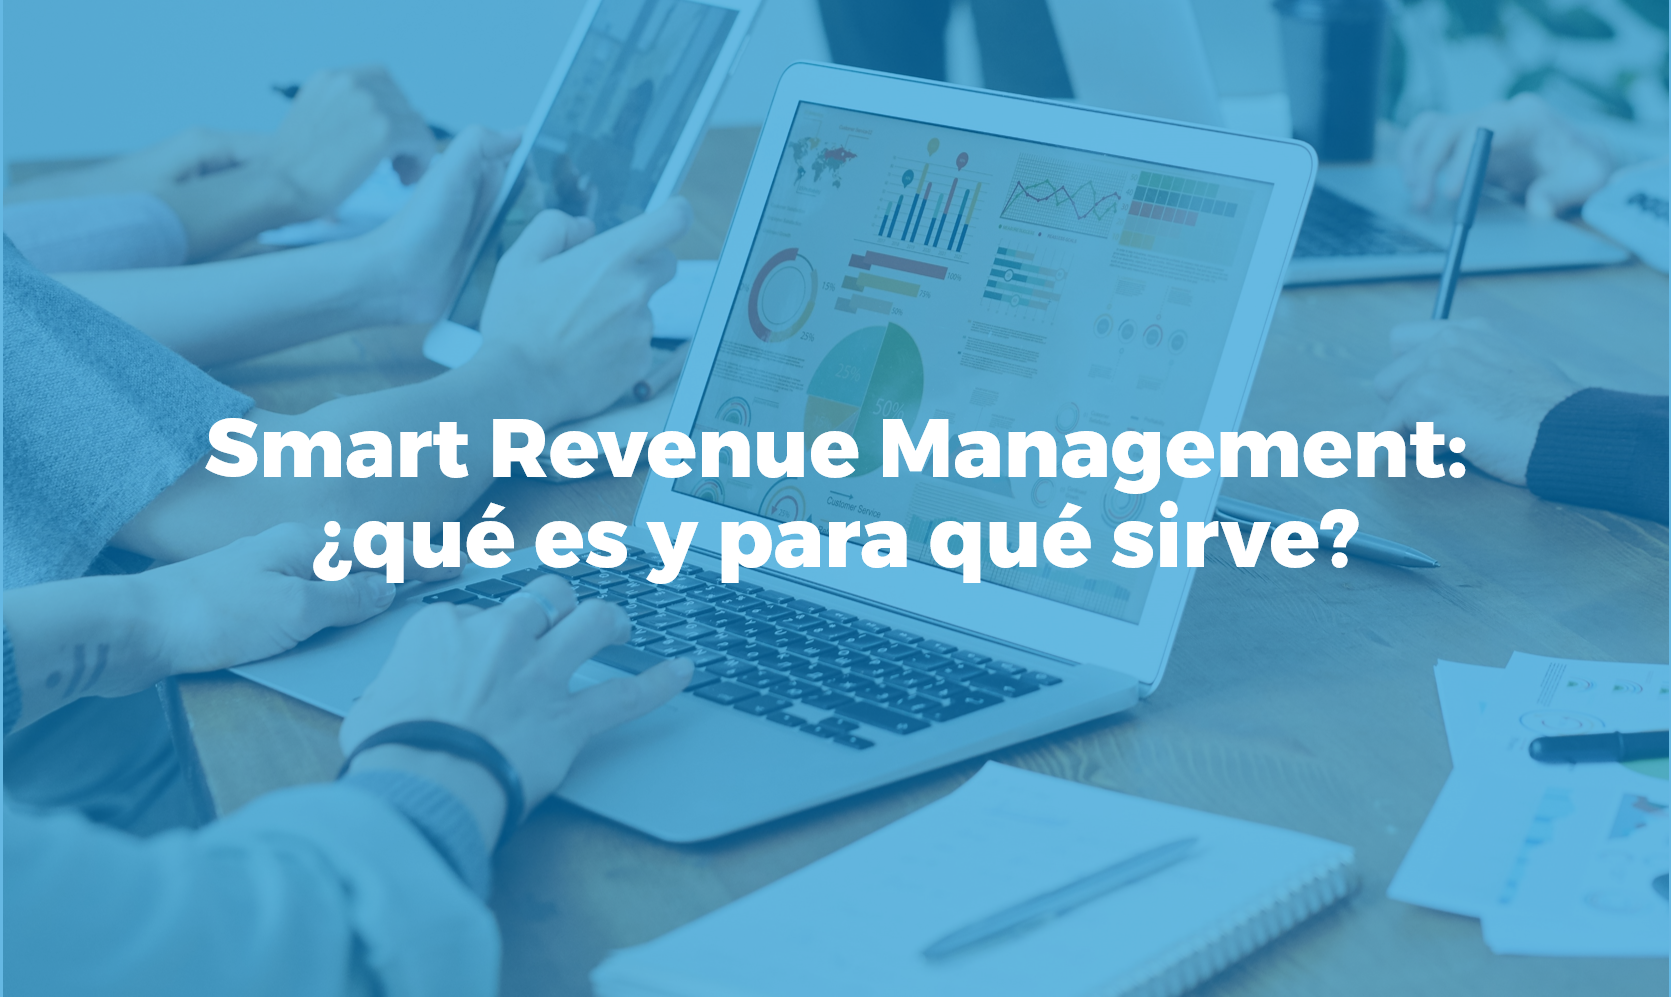 Smart revenue management que es y para que sirve